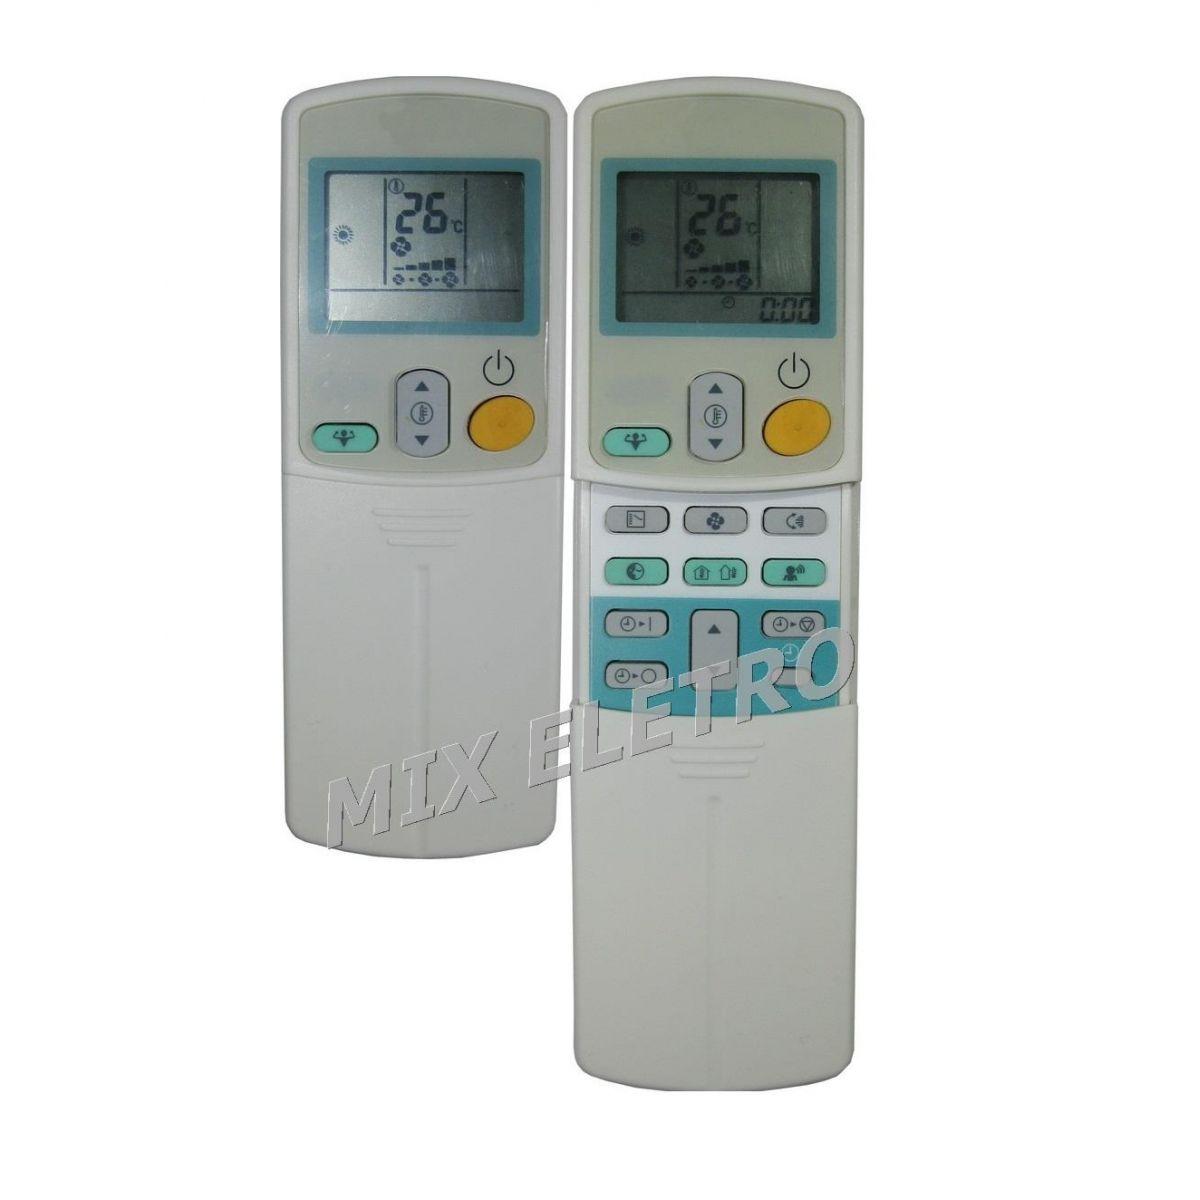 Controle Remoto para Ar Condicionado Split Daikin ARC433A15  - Mix Eletro